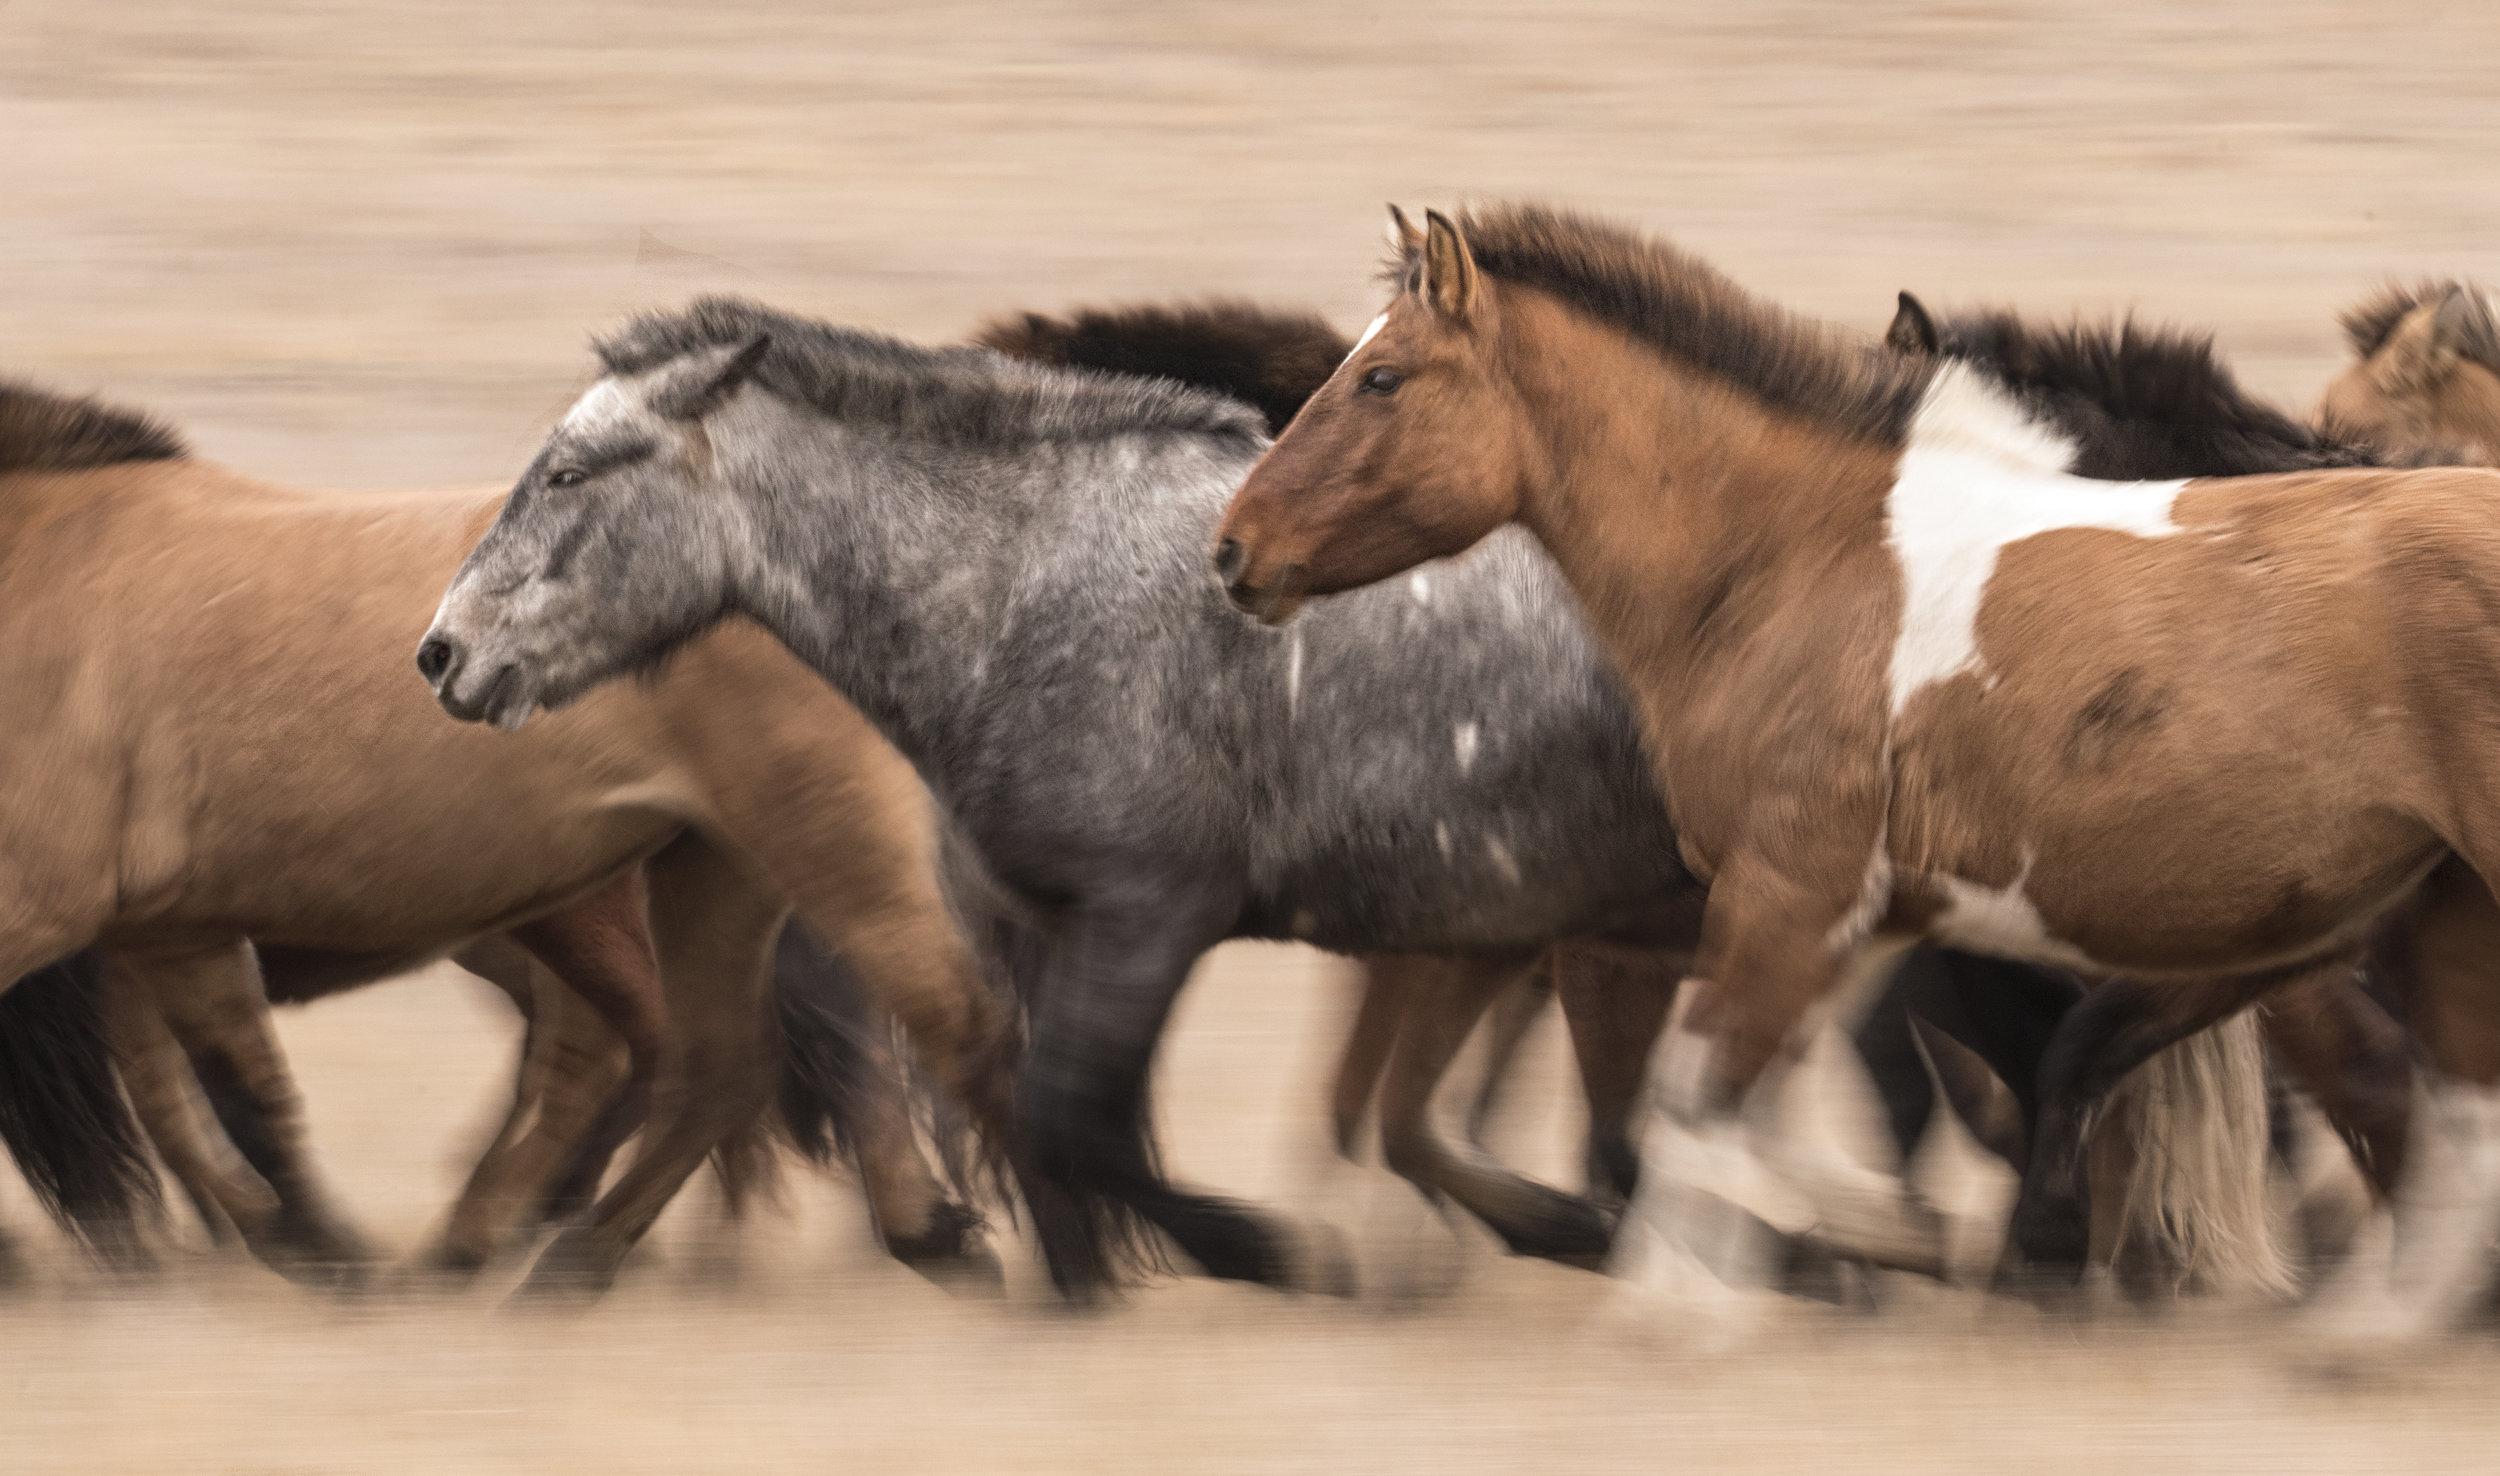 mongolian horse_motion blur_hustai.jpg